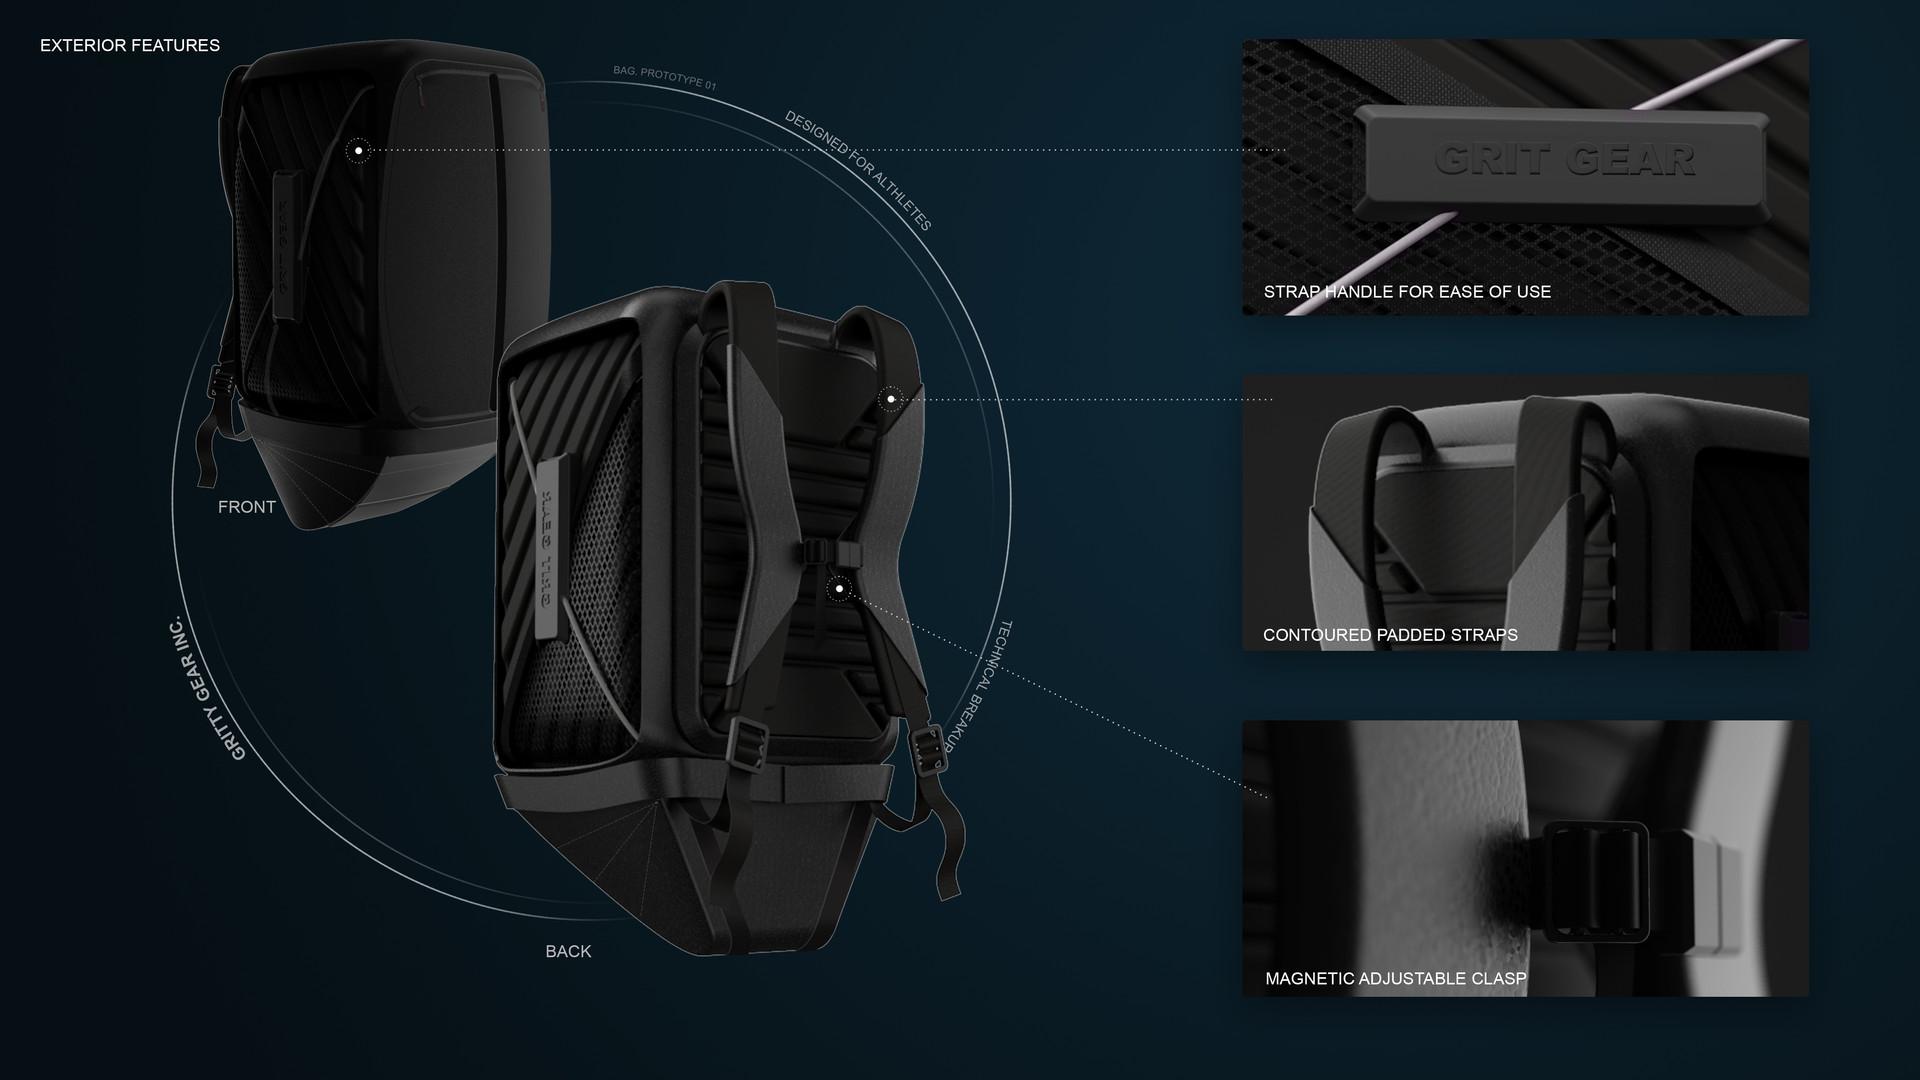 Exterior Features.jpg